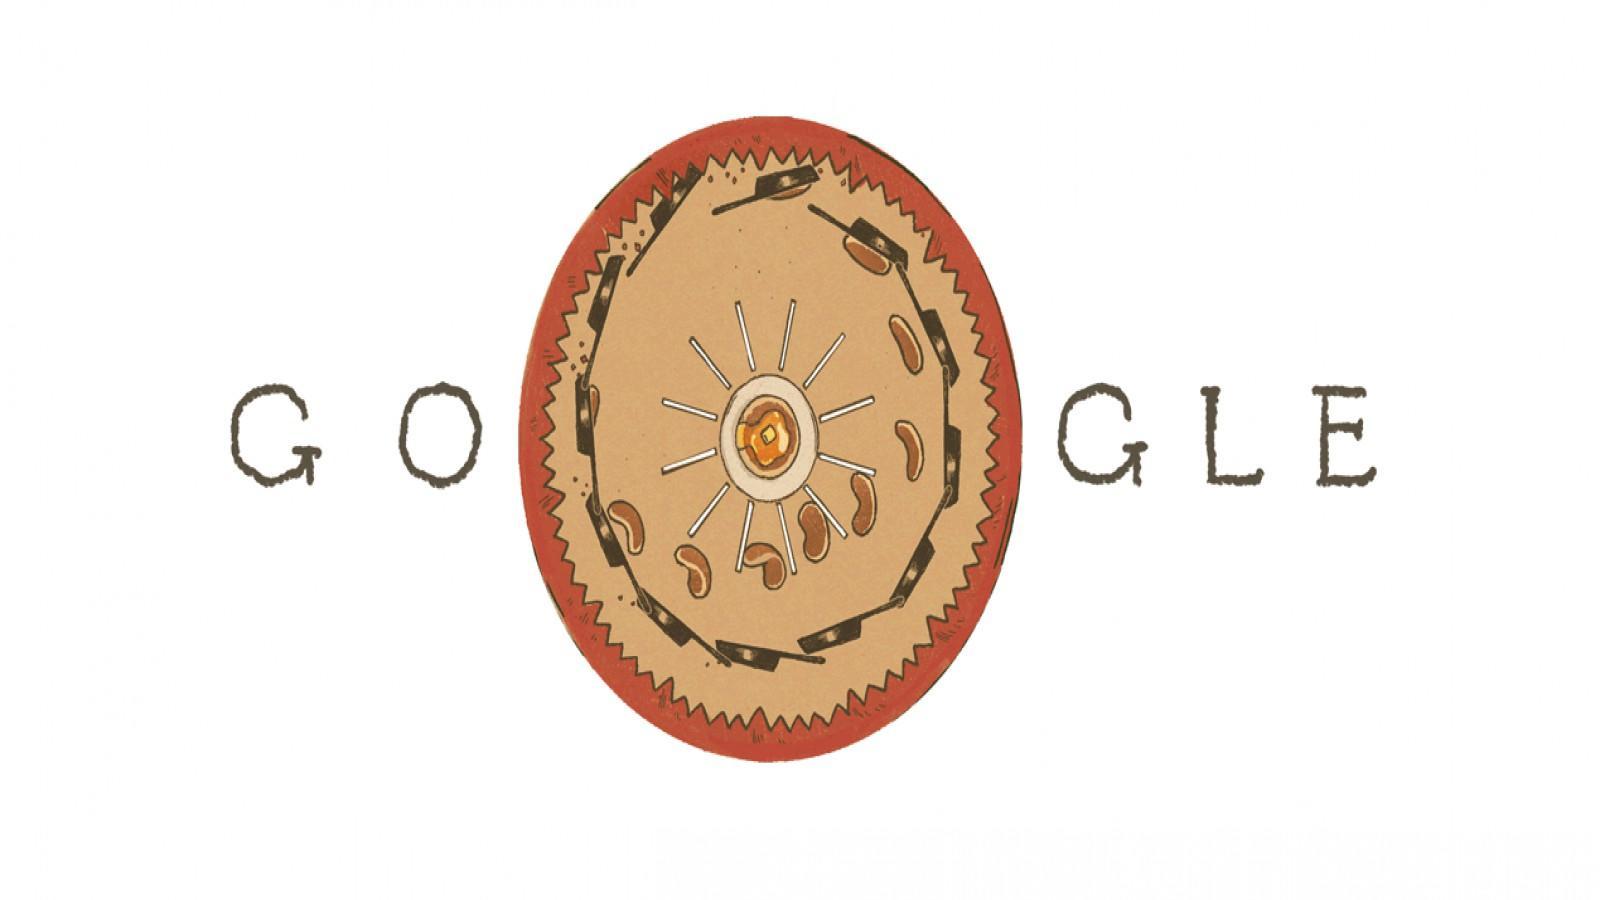 google-doodle-celebrating-218th-birth-anniversary-of-belgian-physicist-joseph-antoine-ferdinand-plateau